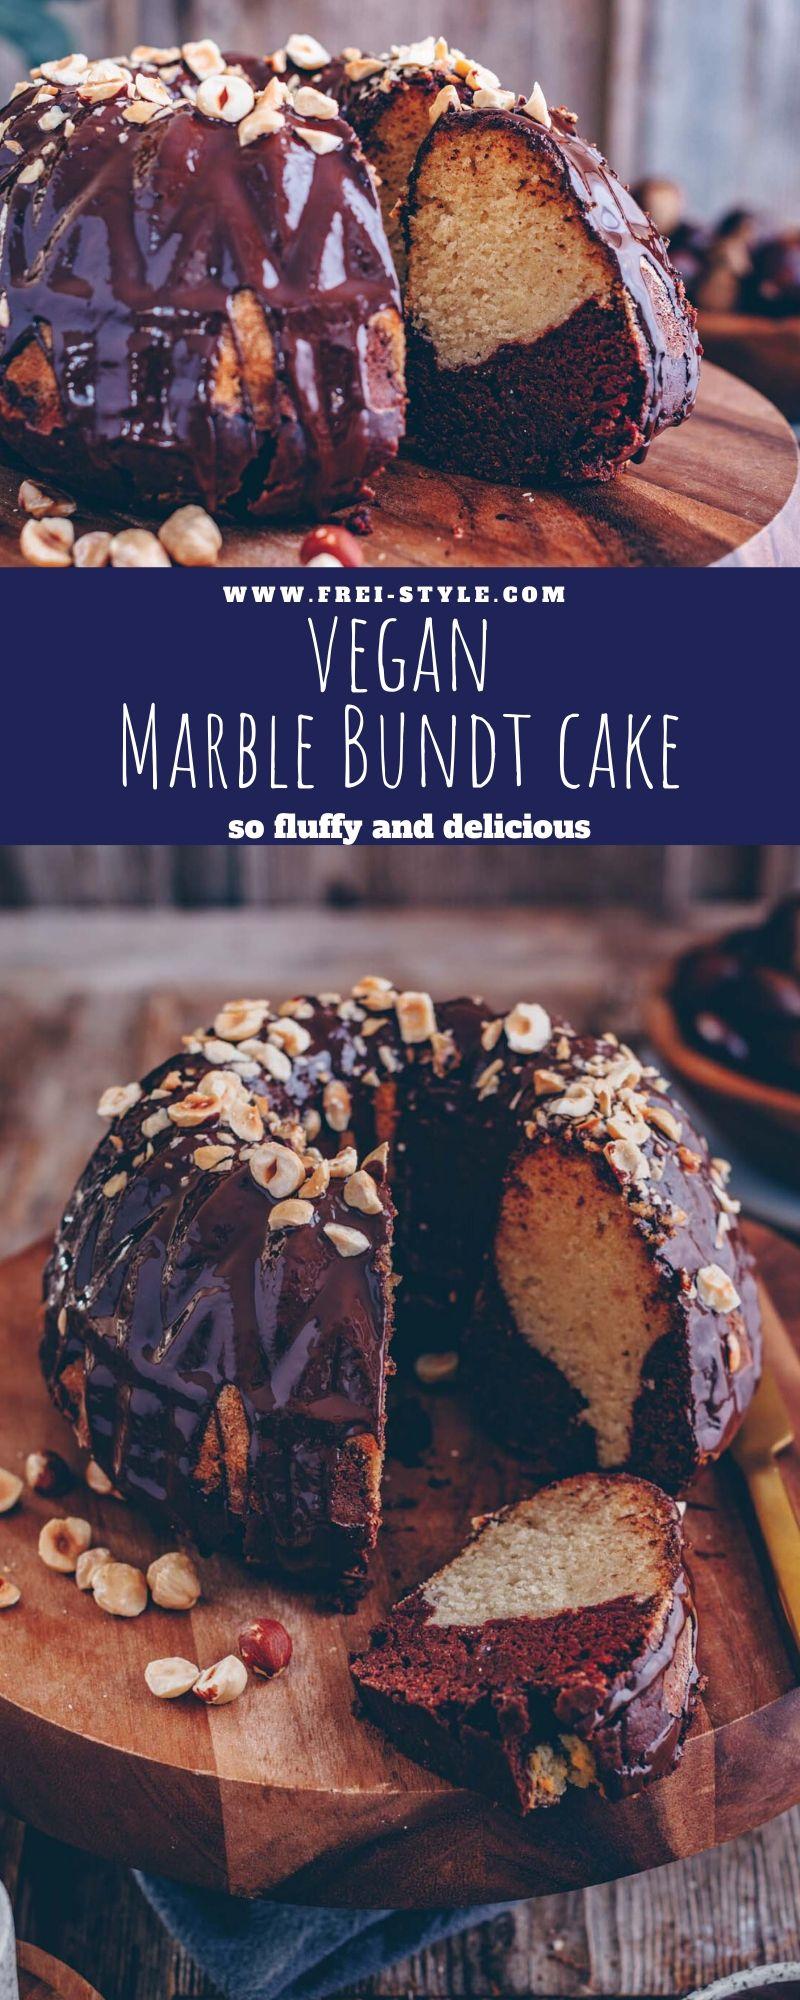 Vegan Marble Bundt cake